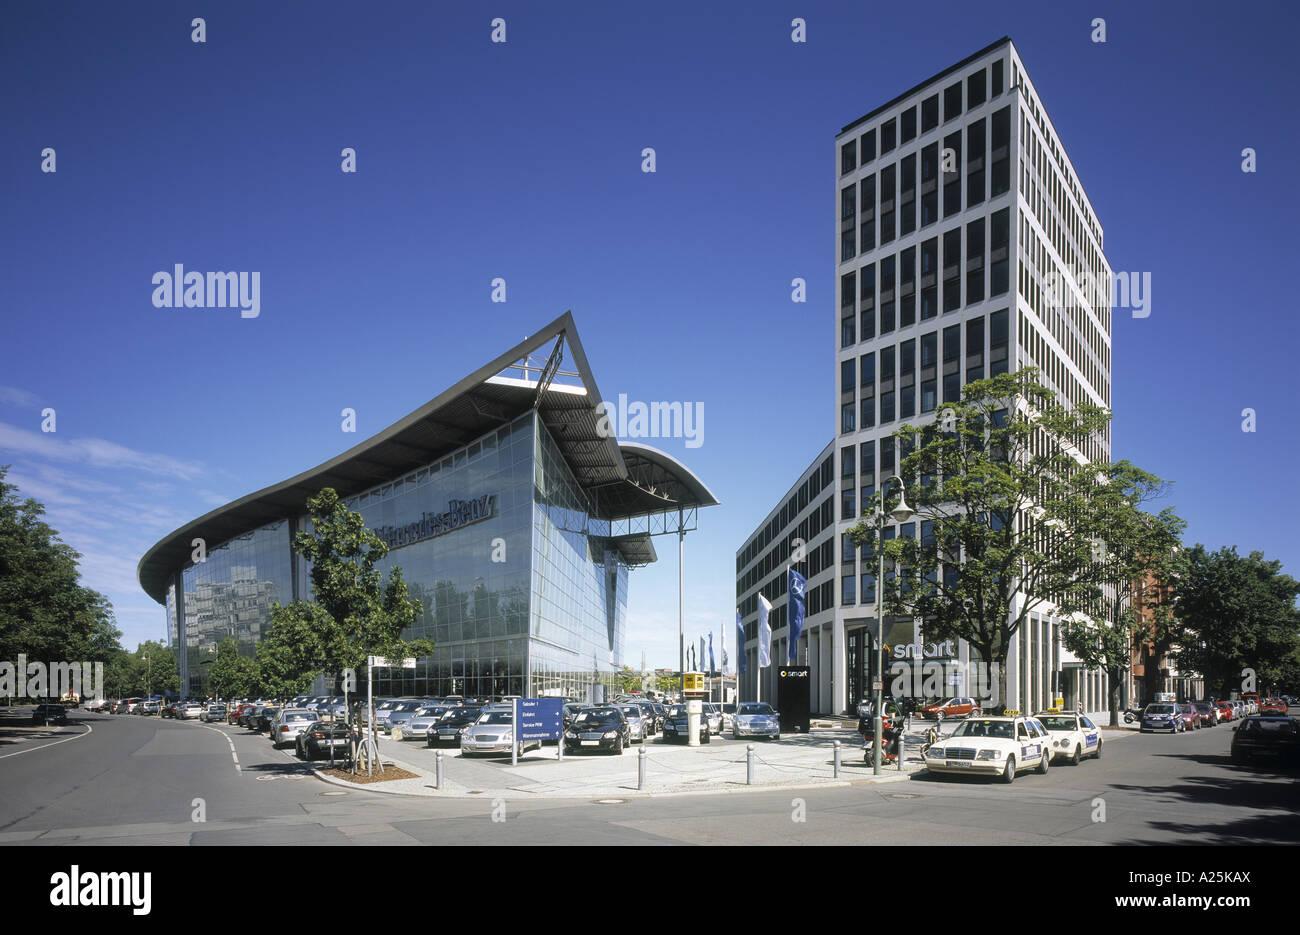 Mercedes Benz dealership near Salzufer, Germany, Berlin Stock Photo